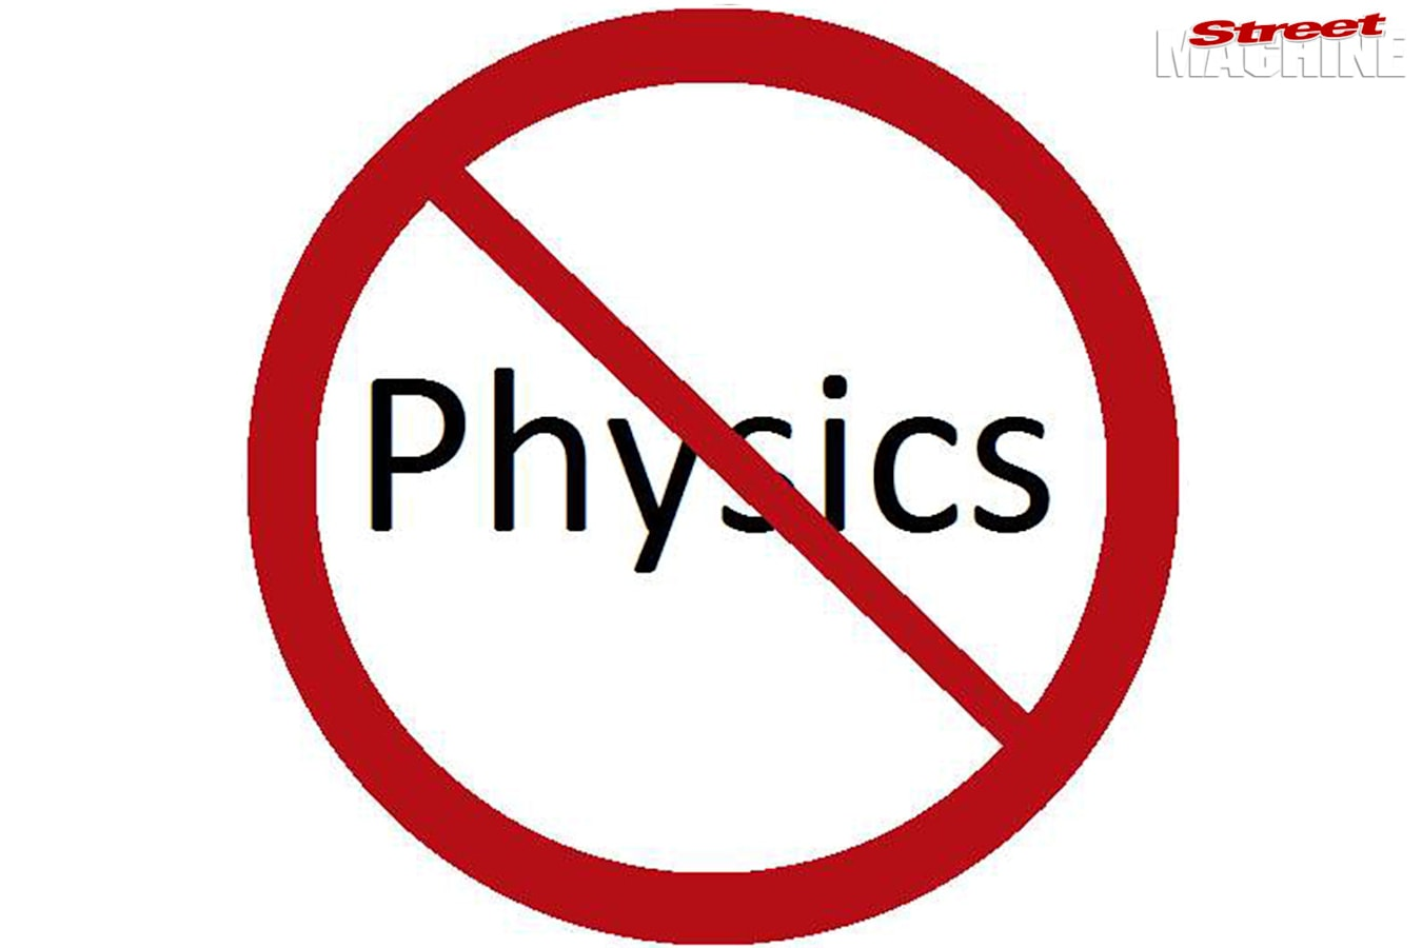 No physcis